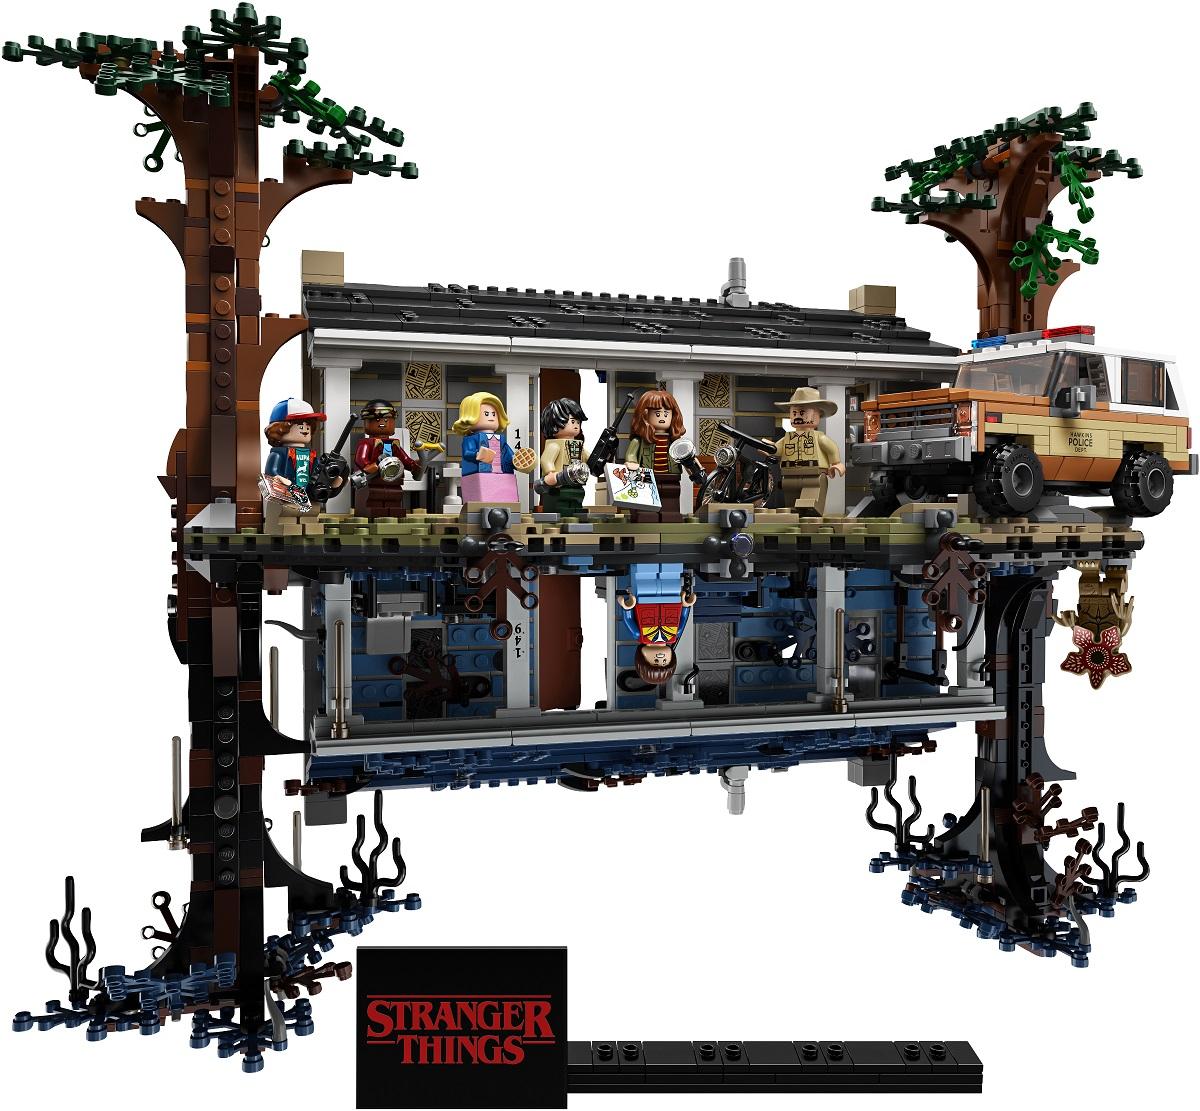 szmk_netflix_stranger_things_lego_upside_down_tothagas_6.jpg